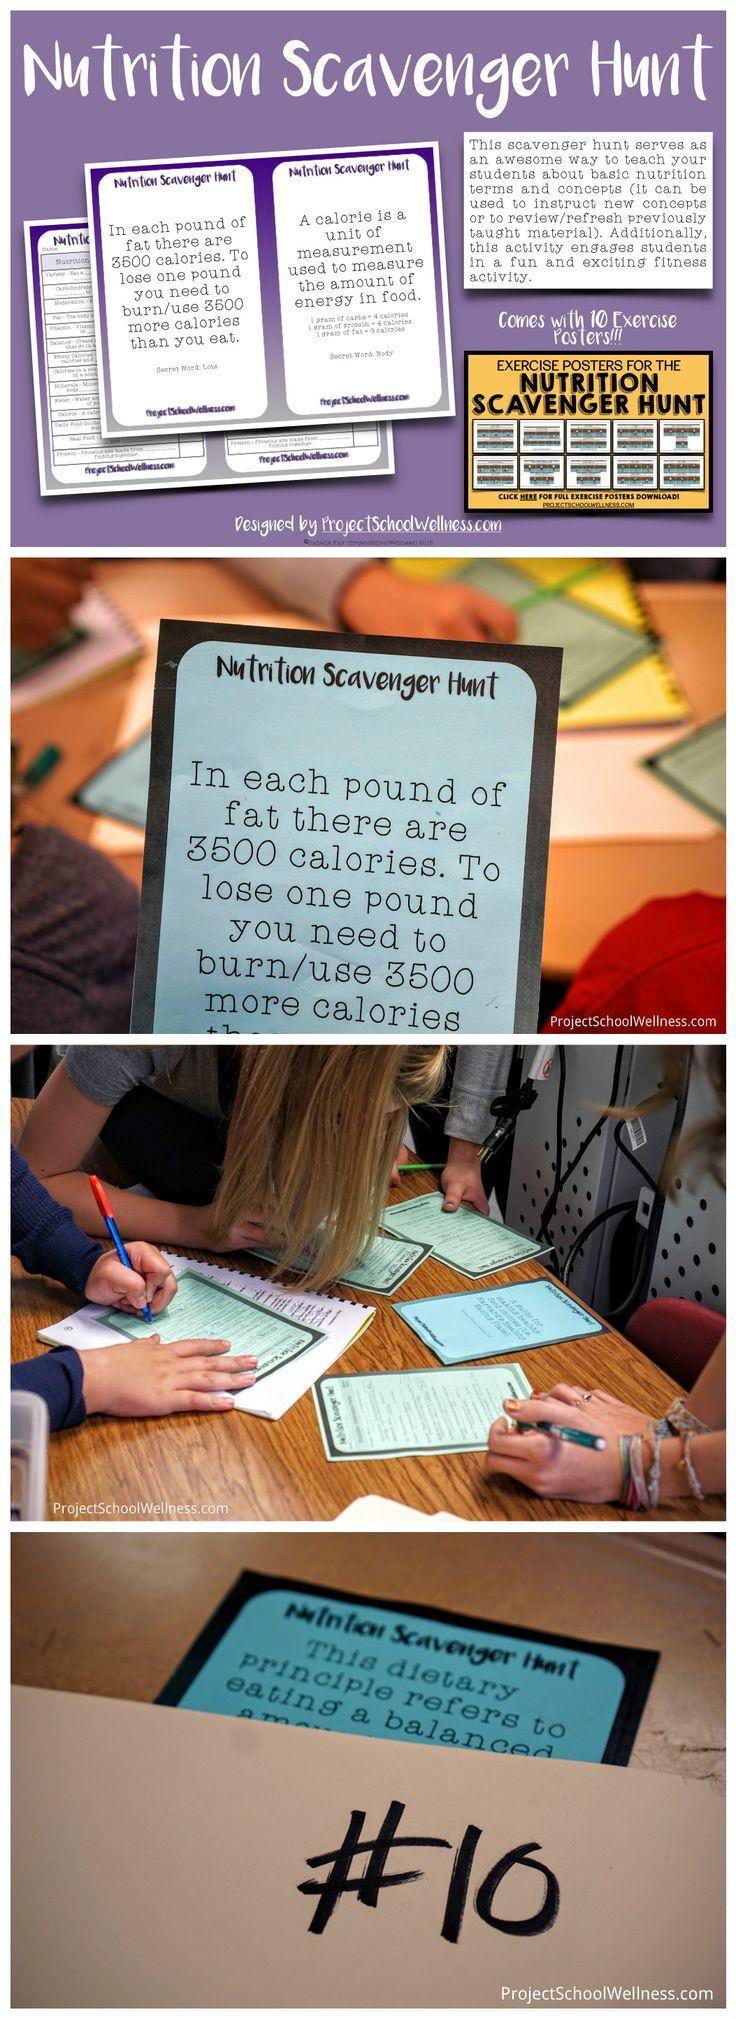 Nutrition Scavenger Hunt - Health Lesson Plans   Health Education   Middle School   High School